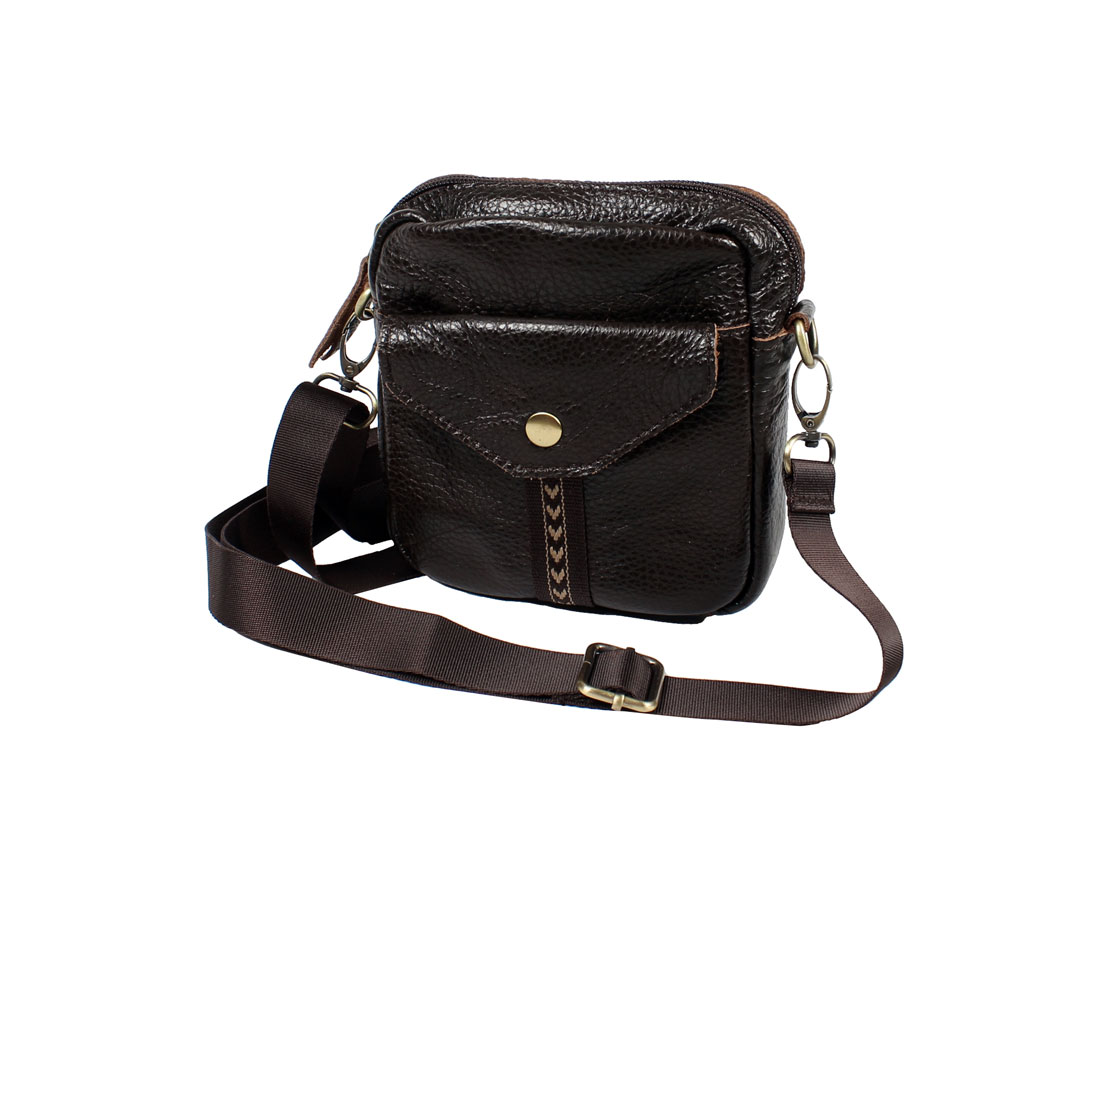 Unisex Adjustable Strap Litchi Pattern Coffee Color Faux Leather Zip up Shoulder Bag